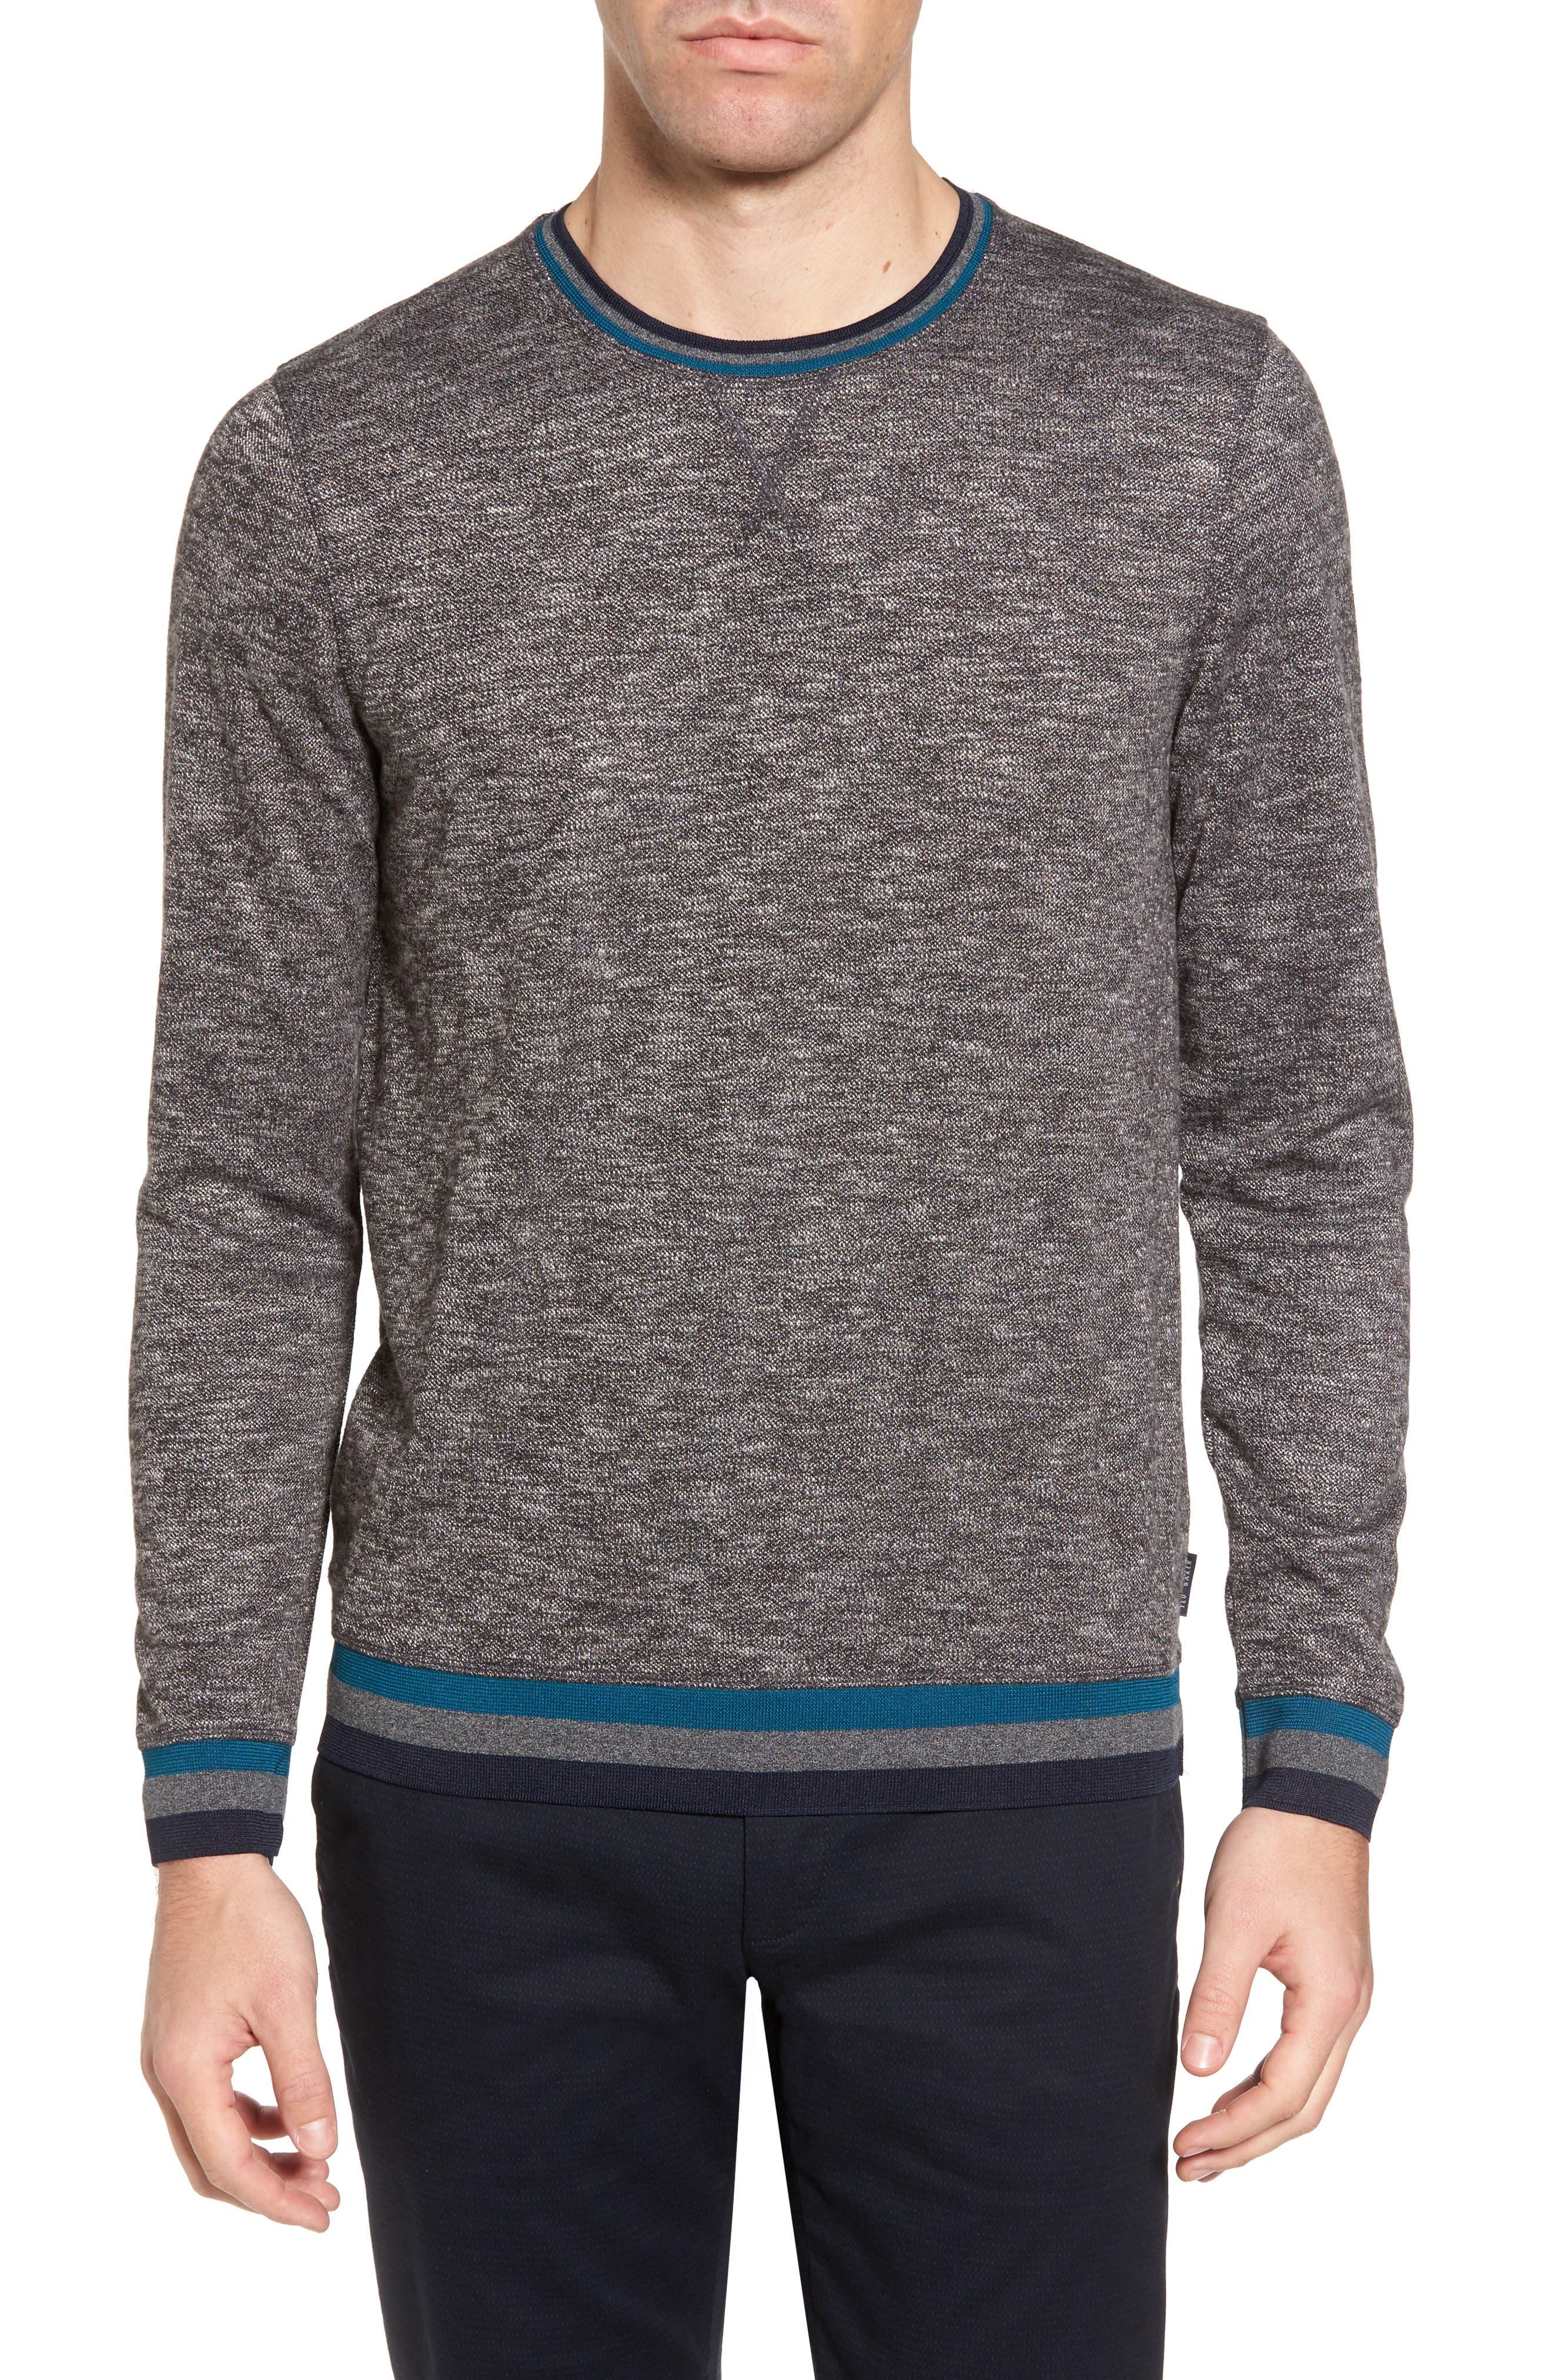 Slater Trim Fit Slub Sweatshirt,                         Main,                         color, Black